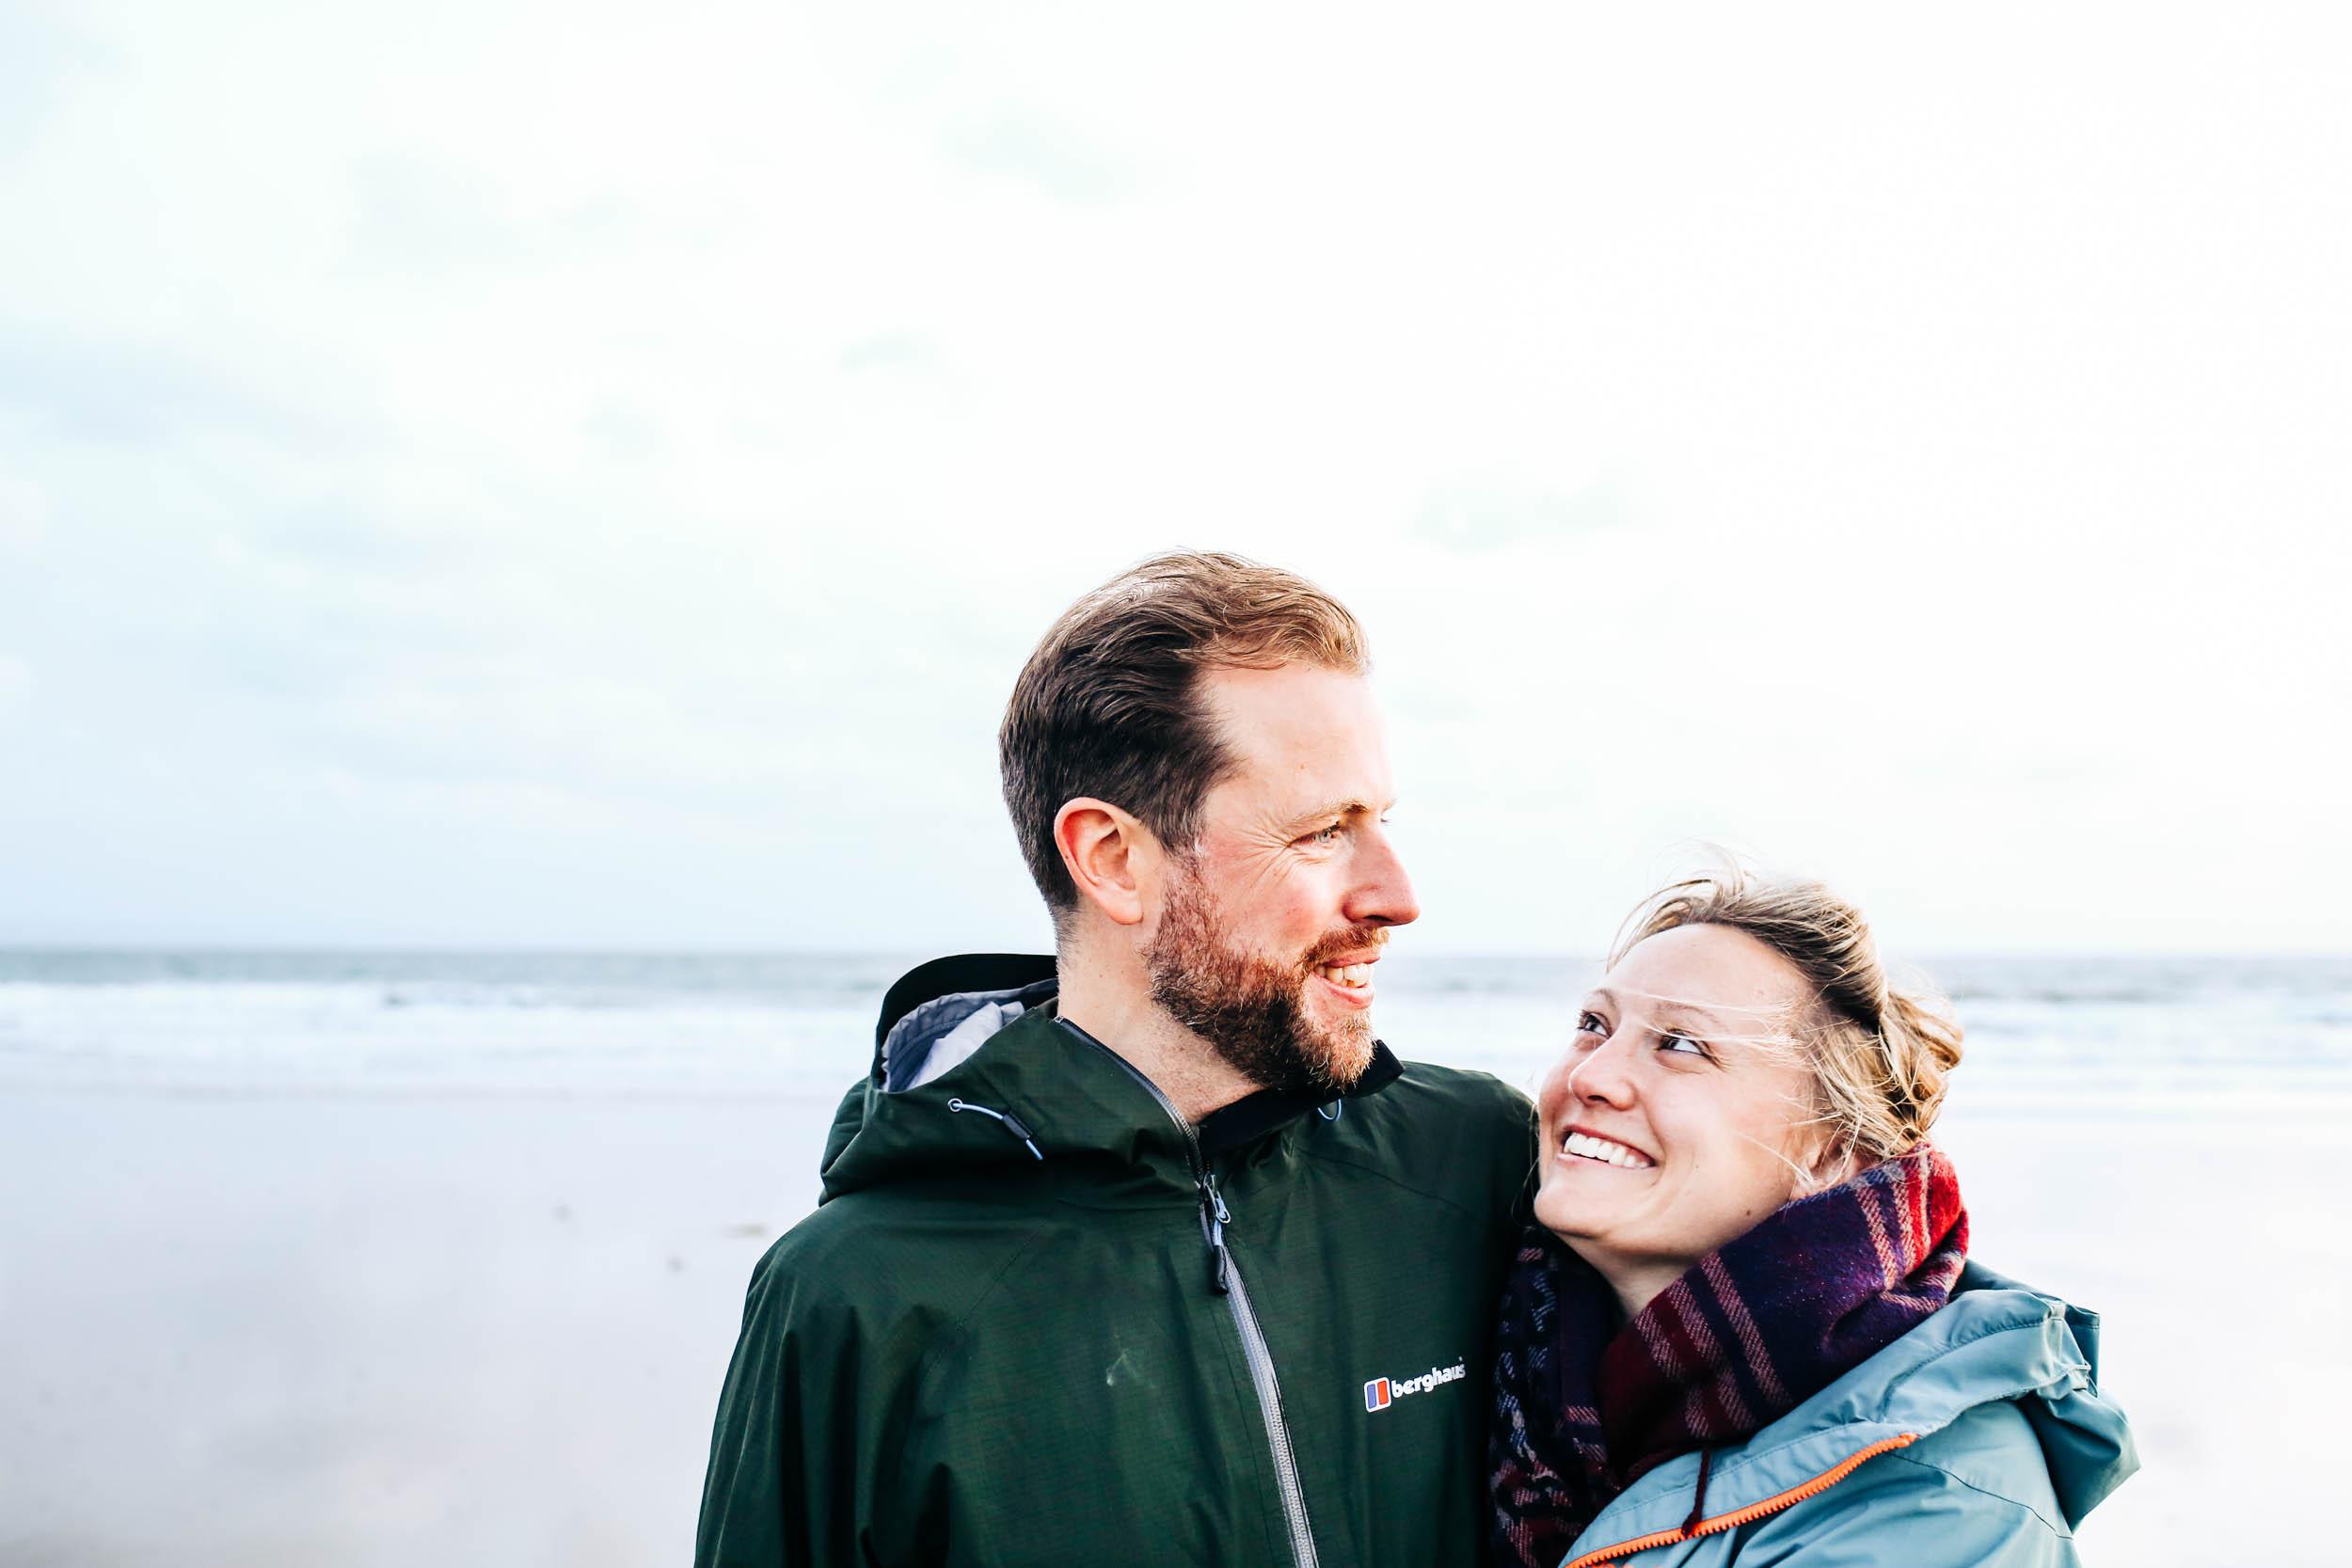 Alex_Sedgmond_Photography-MerthyrMawr-PreweddingPhotography-Penny&Mike-22.jpg